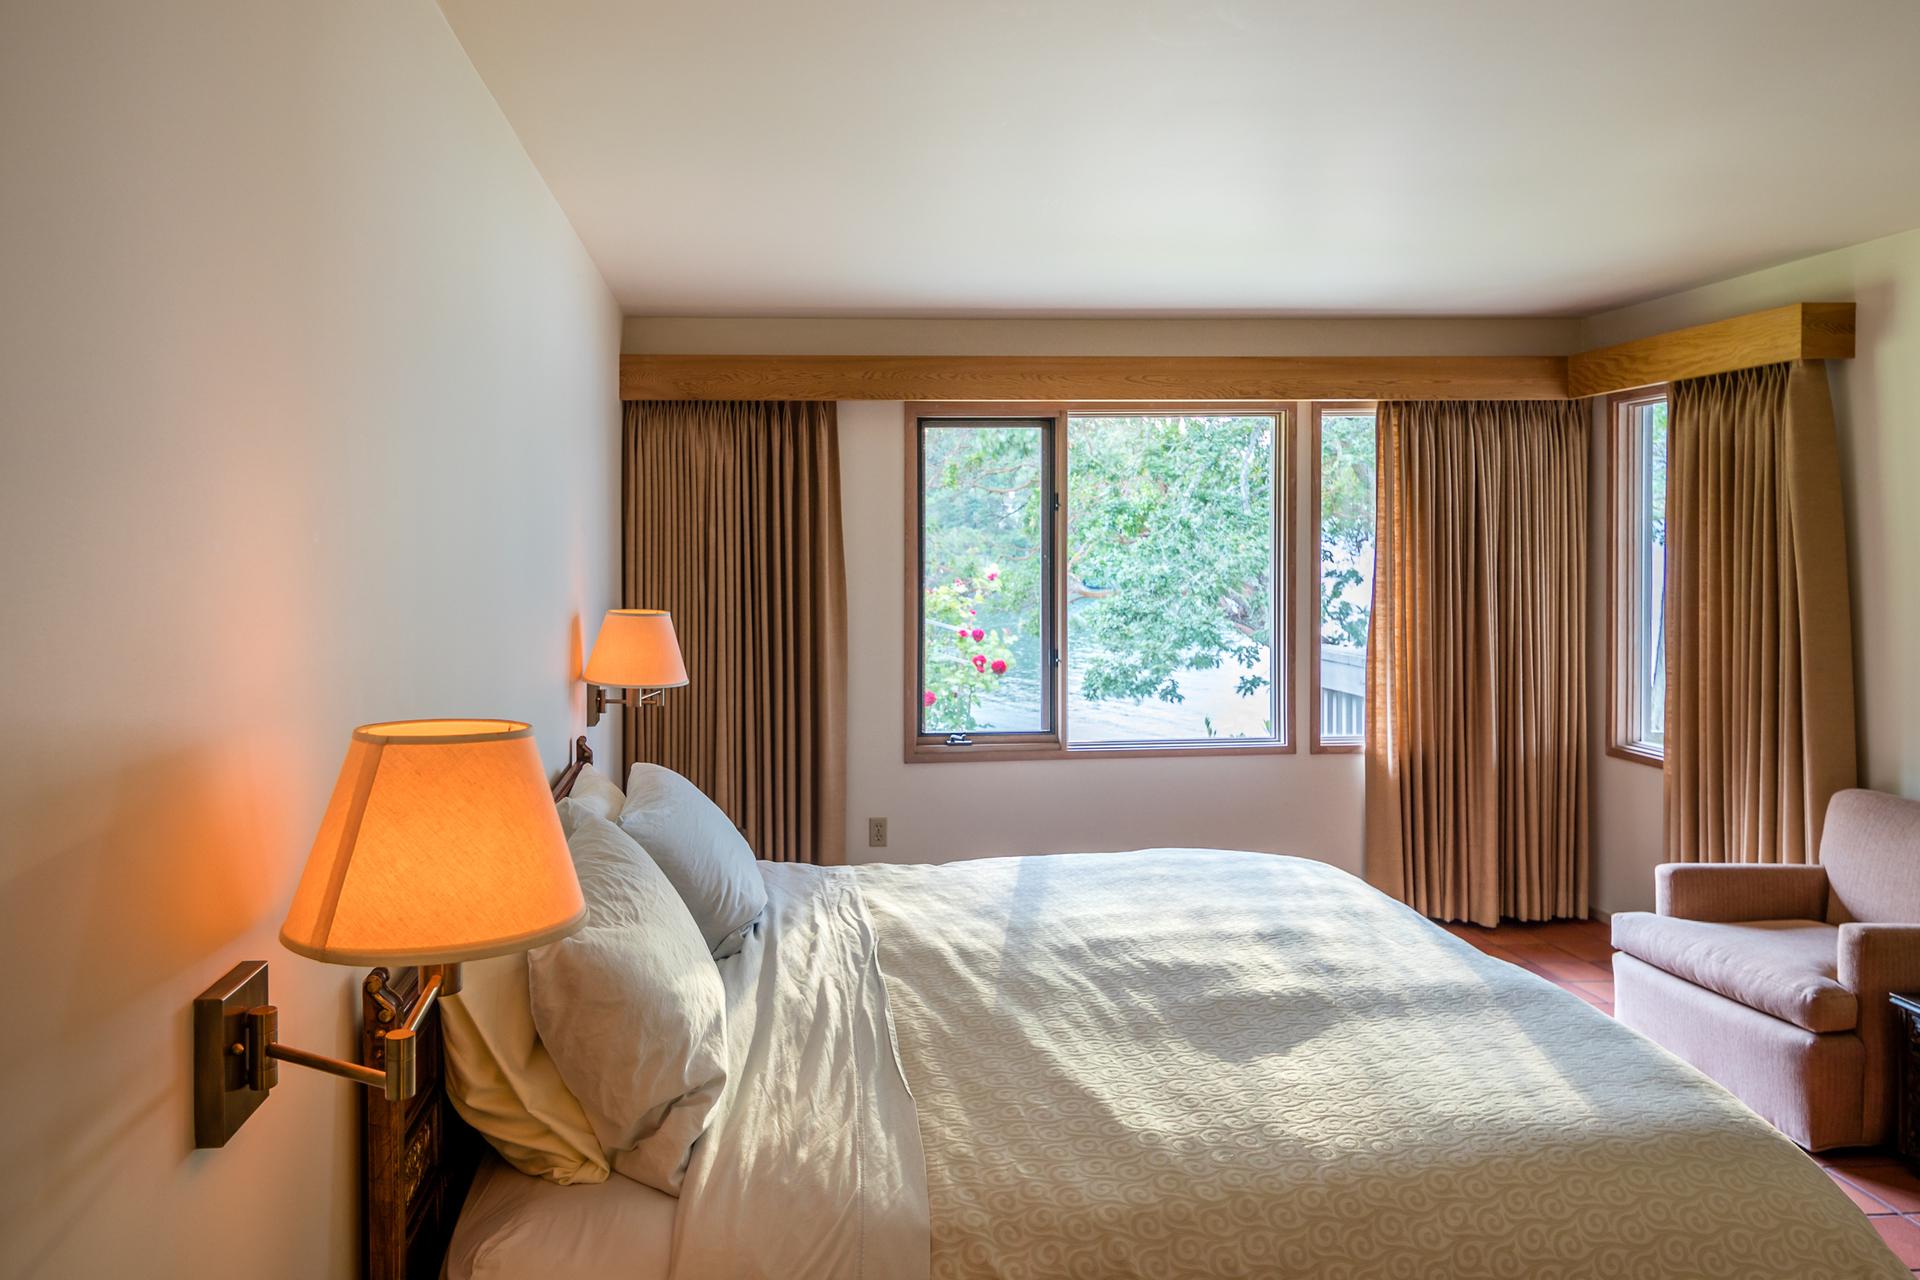 Guest Room at 1850 Lands End Road, Lands End, North Saanich